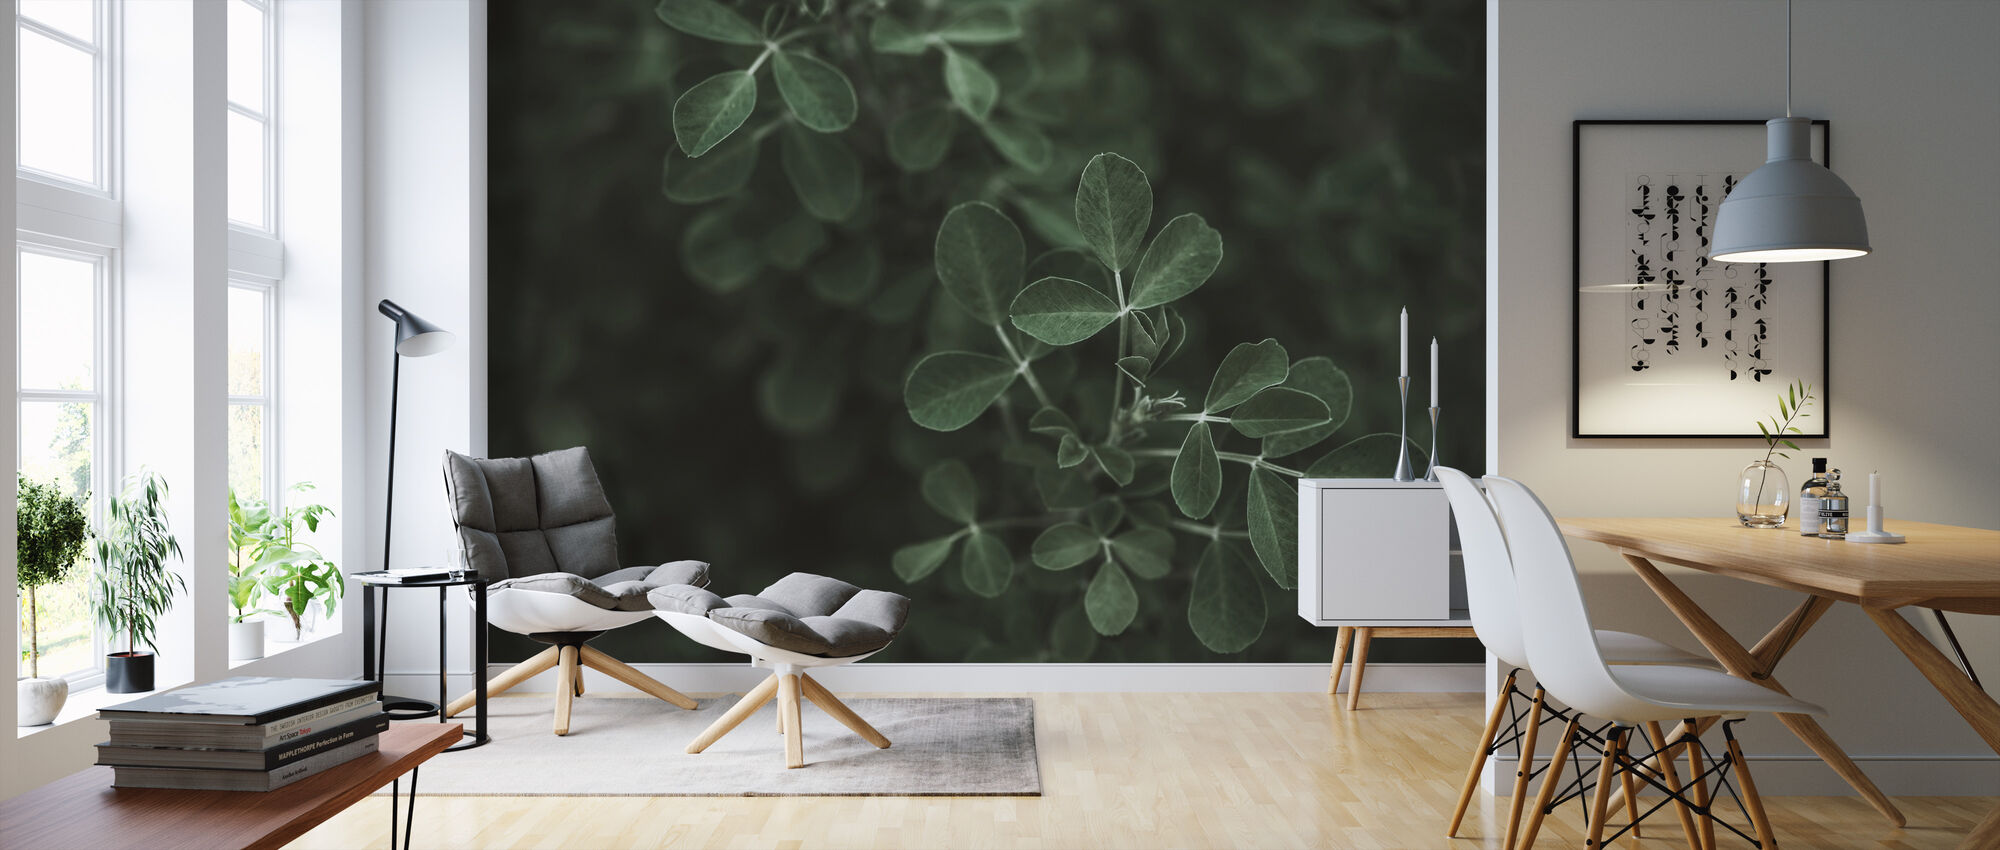 Low Key Leaf - Wallpaper - Living Room